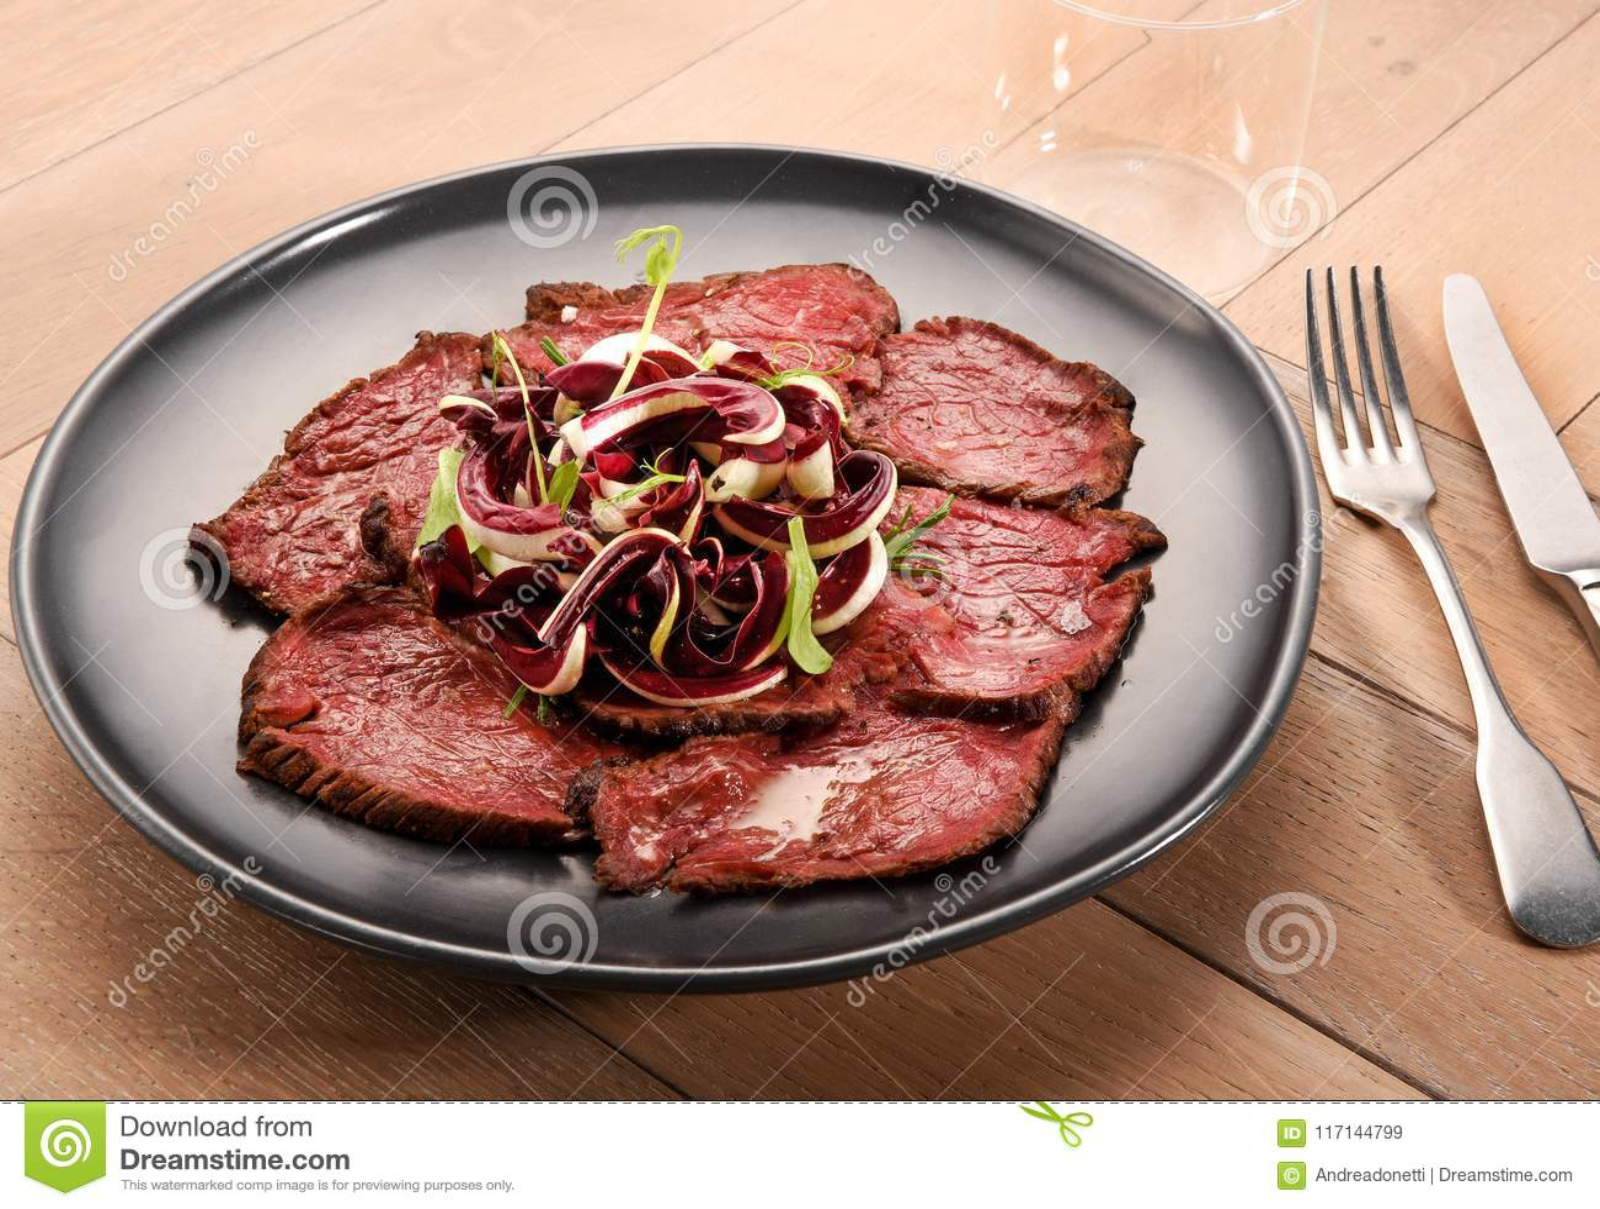 Sliced roast beef with radicchio salad stock image image of.